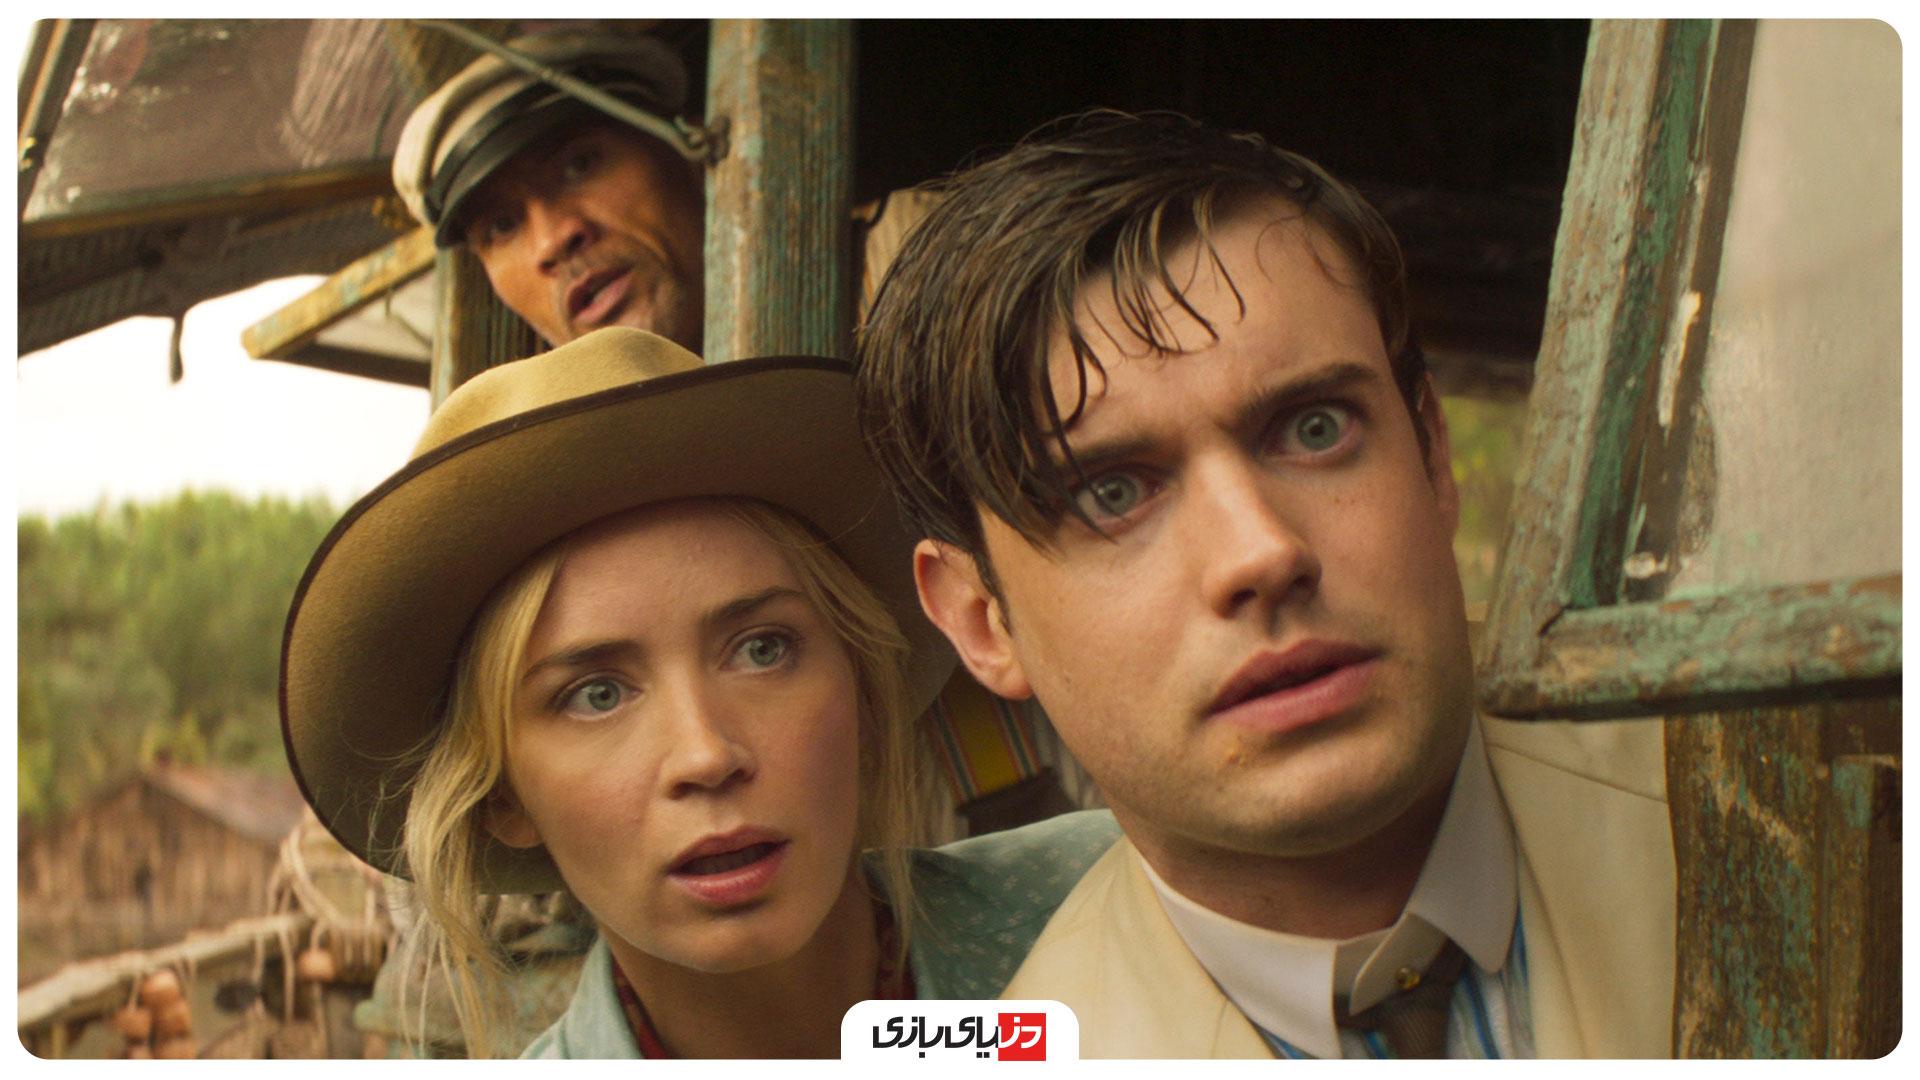 تاریخ اکران فیلم jungle cruise